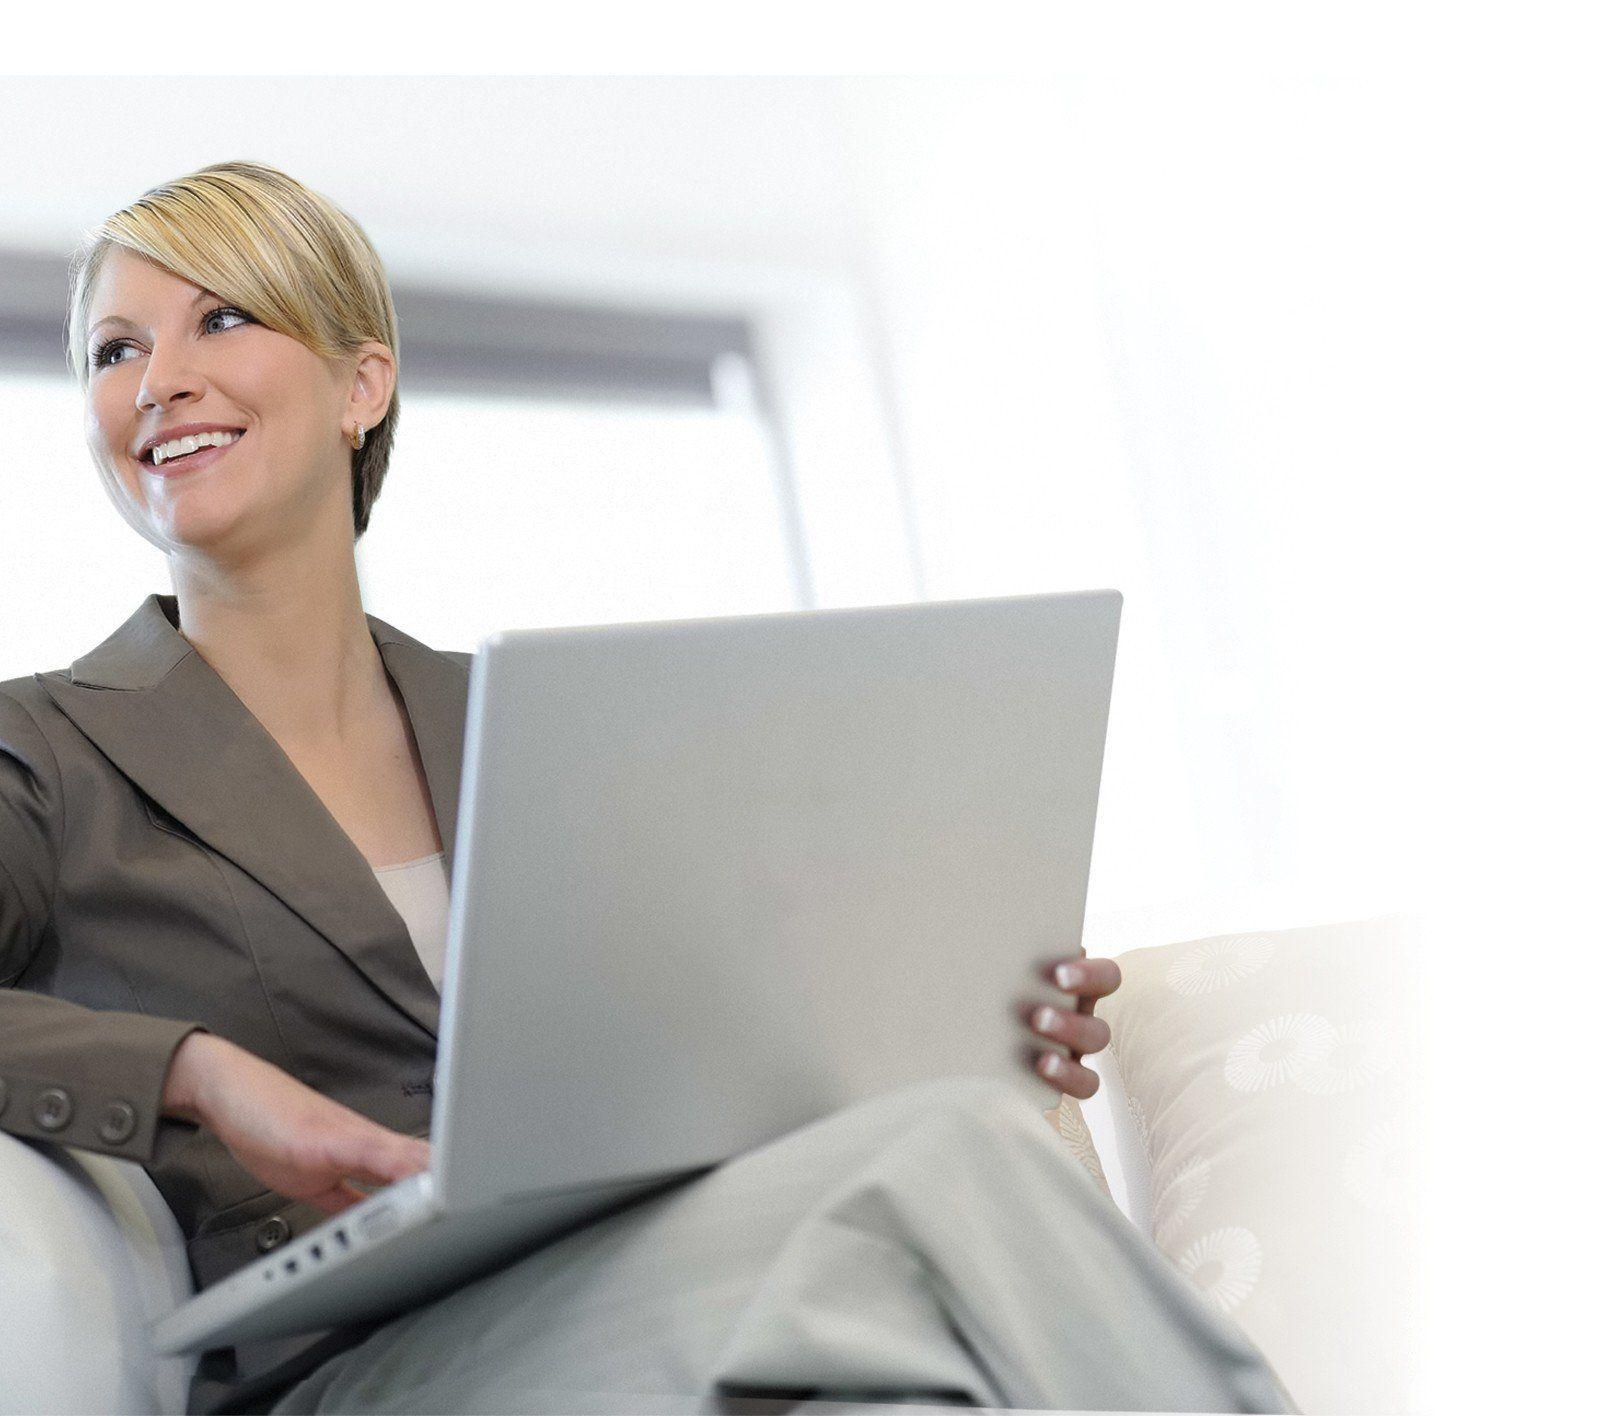 Woman With Laptop Stock Photo 634668d7c617358e Jpg 1616 1416 Cash Advance Loans Emergency Loans Same Day Loans